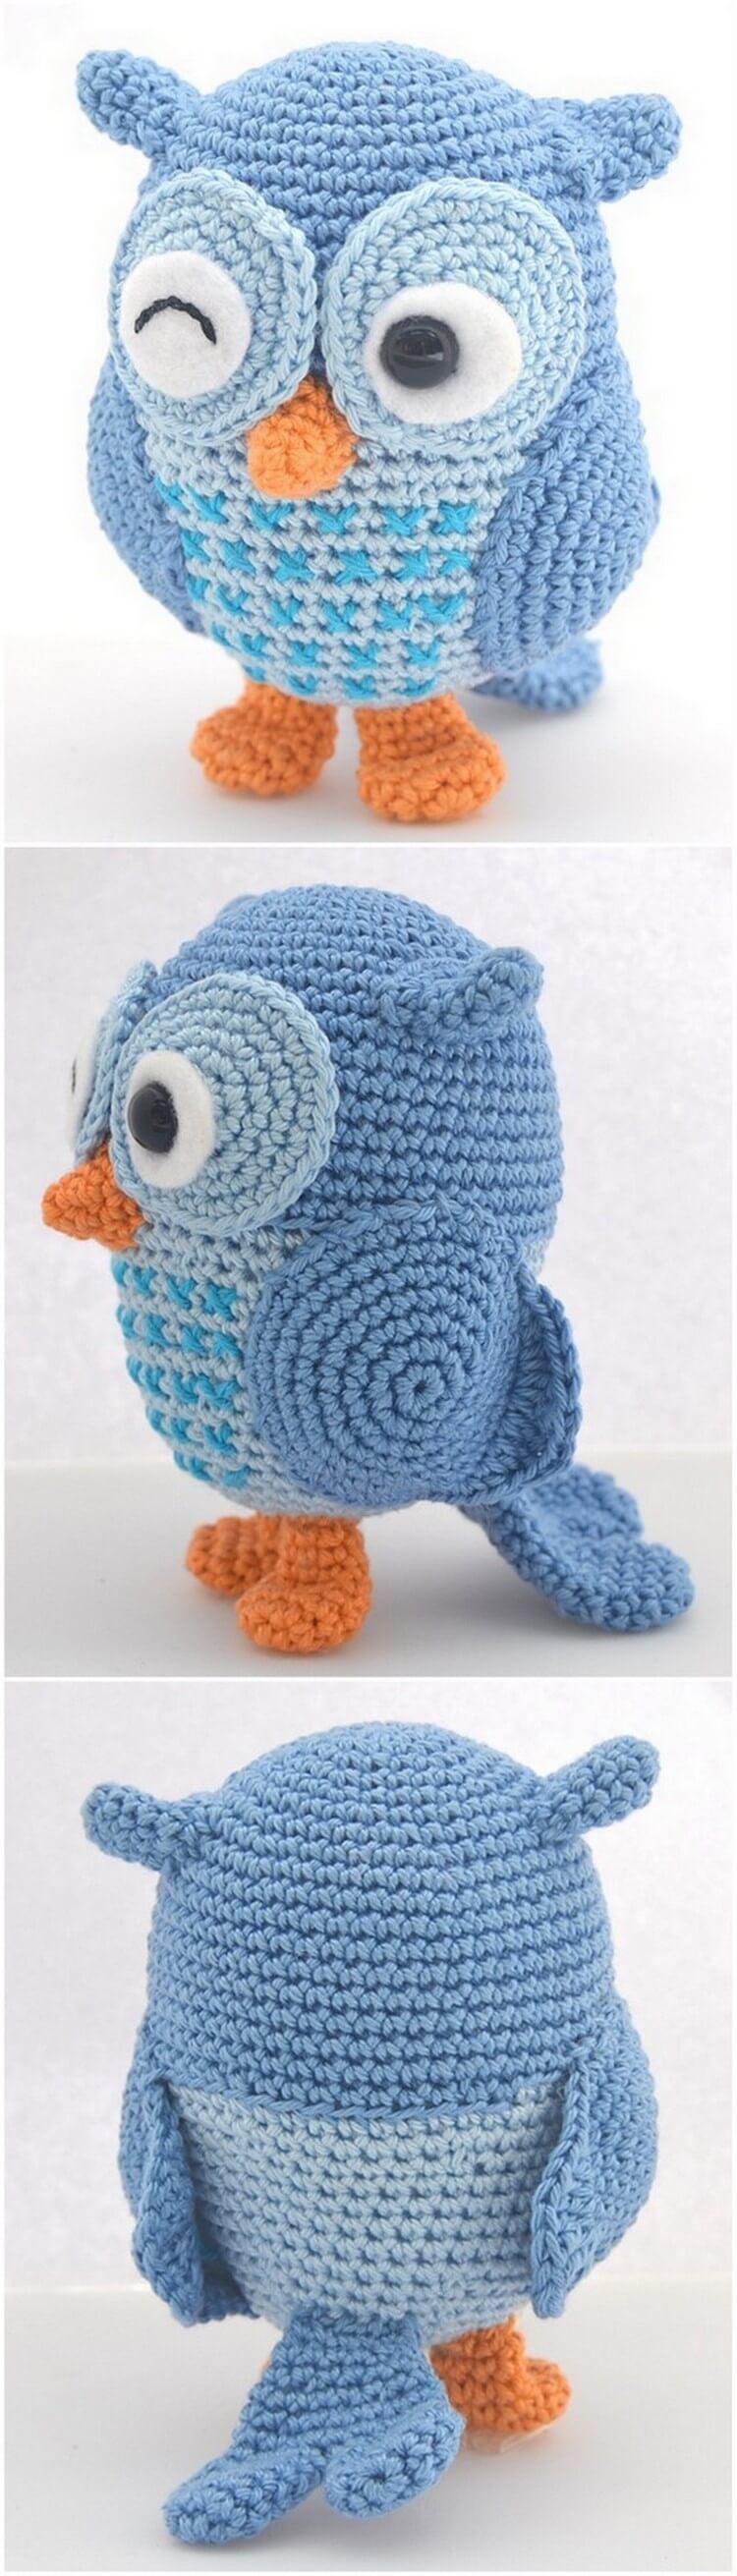 Crochet Amigurumi Pattern (102)